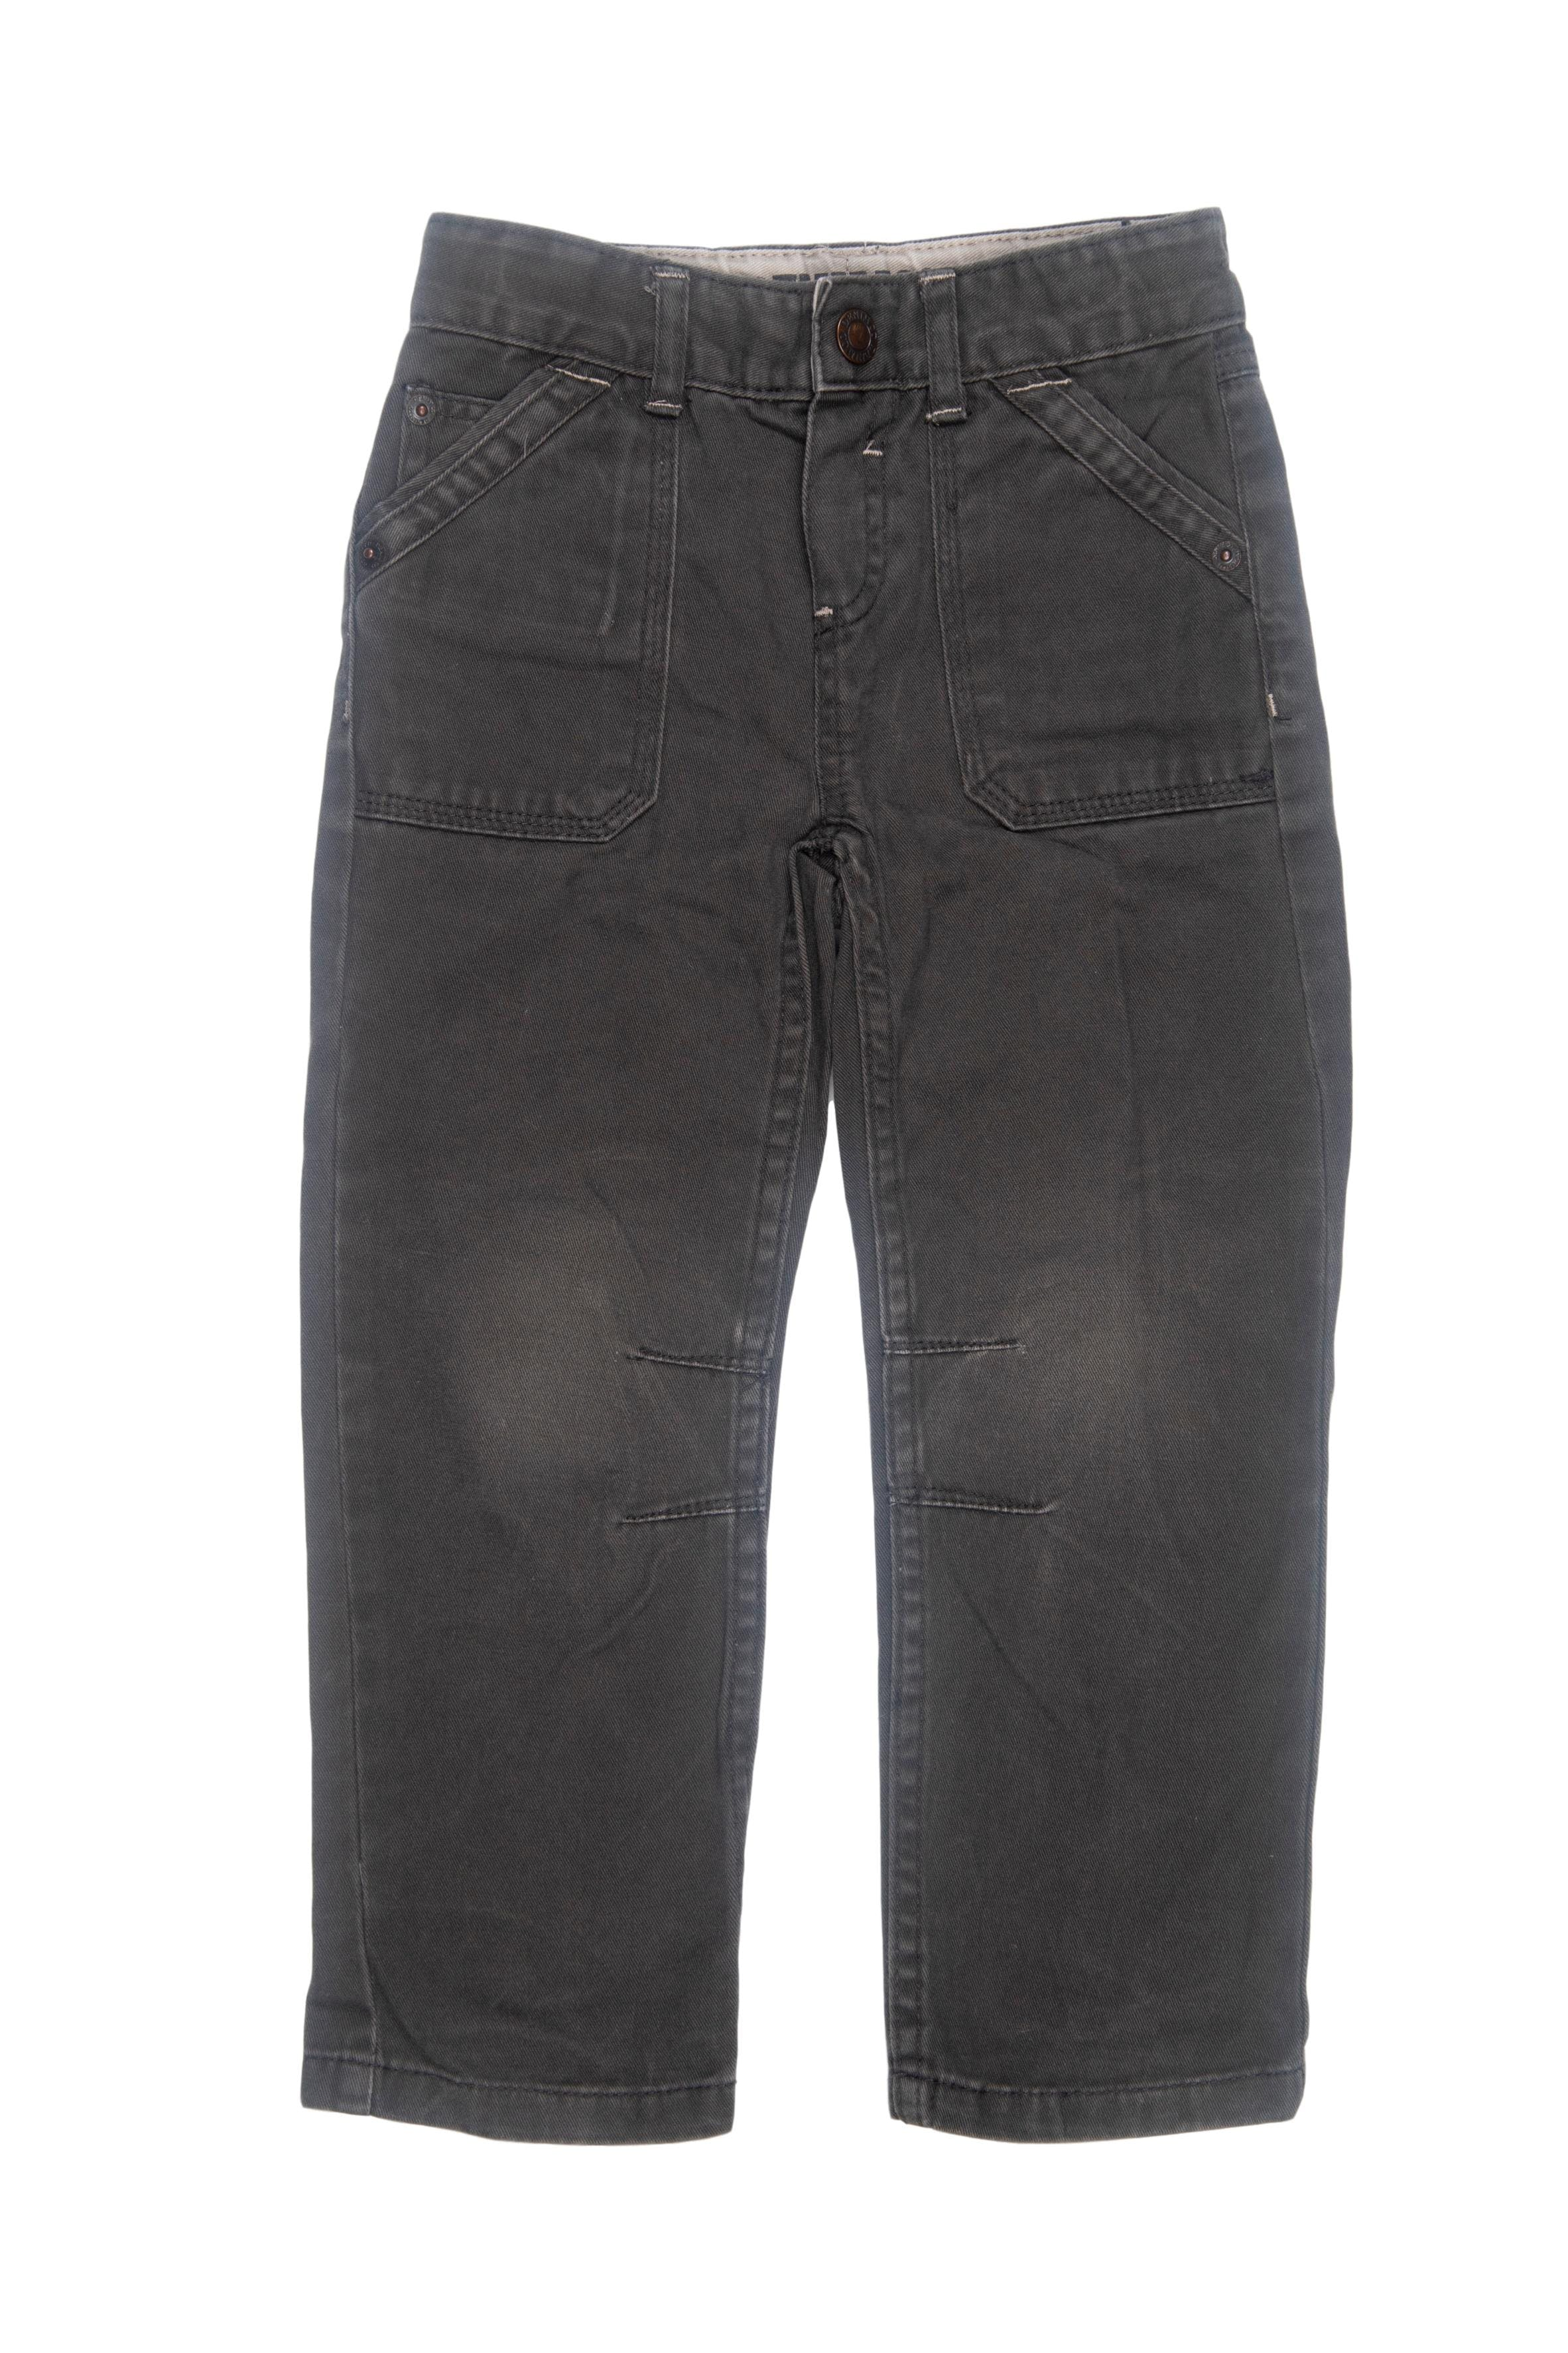 Jean gris 100% algodón, cintura regulable - Denim Co